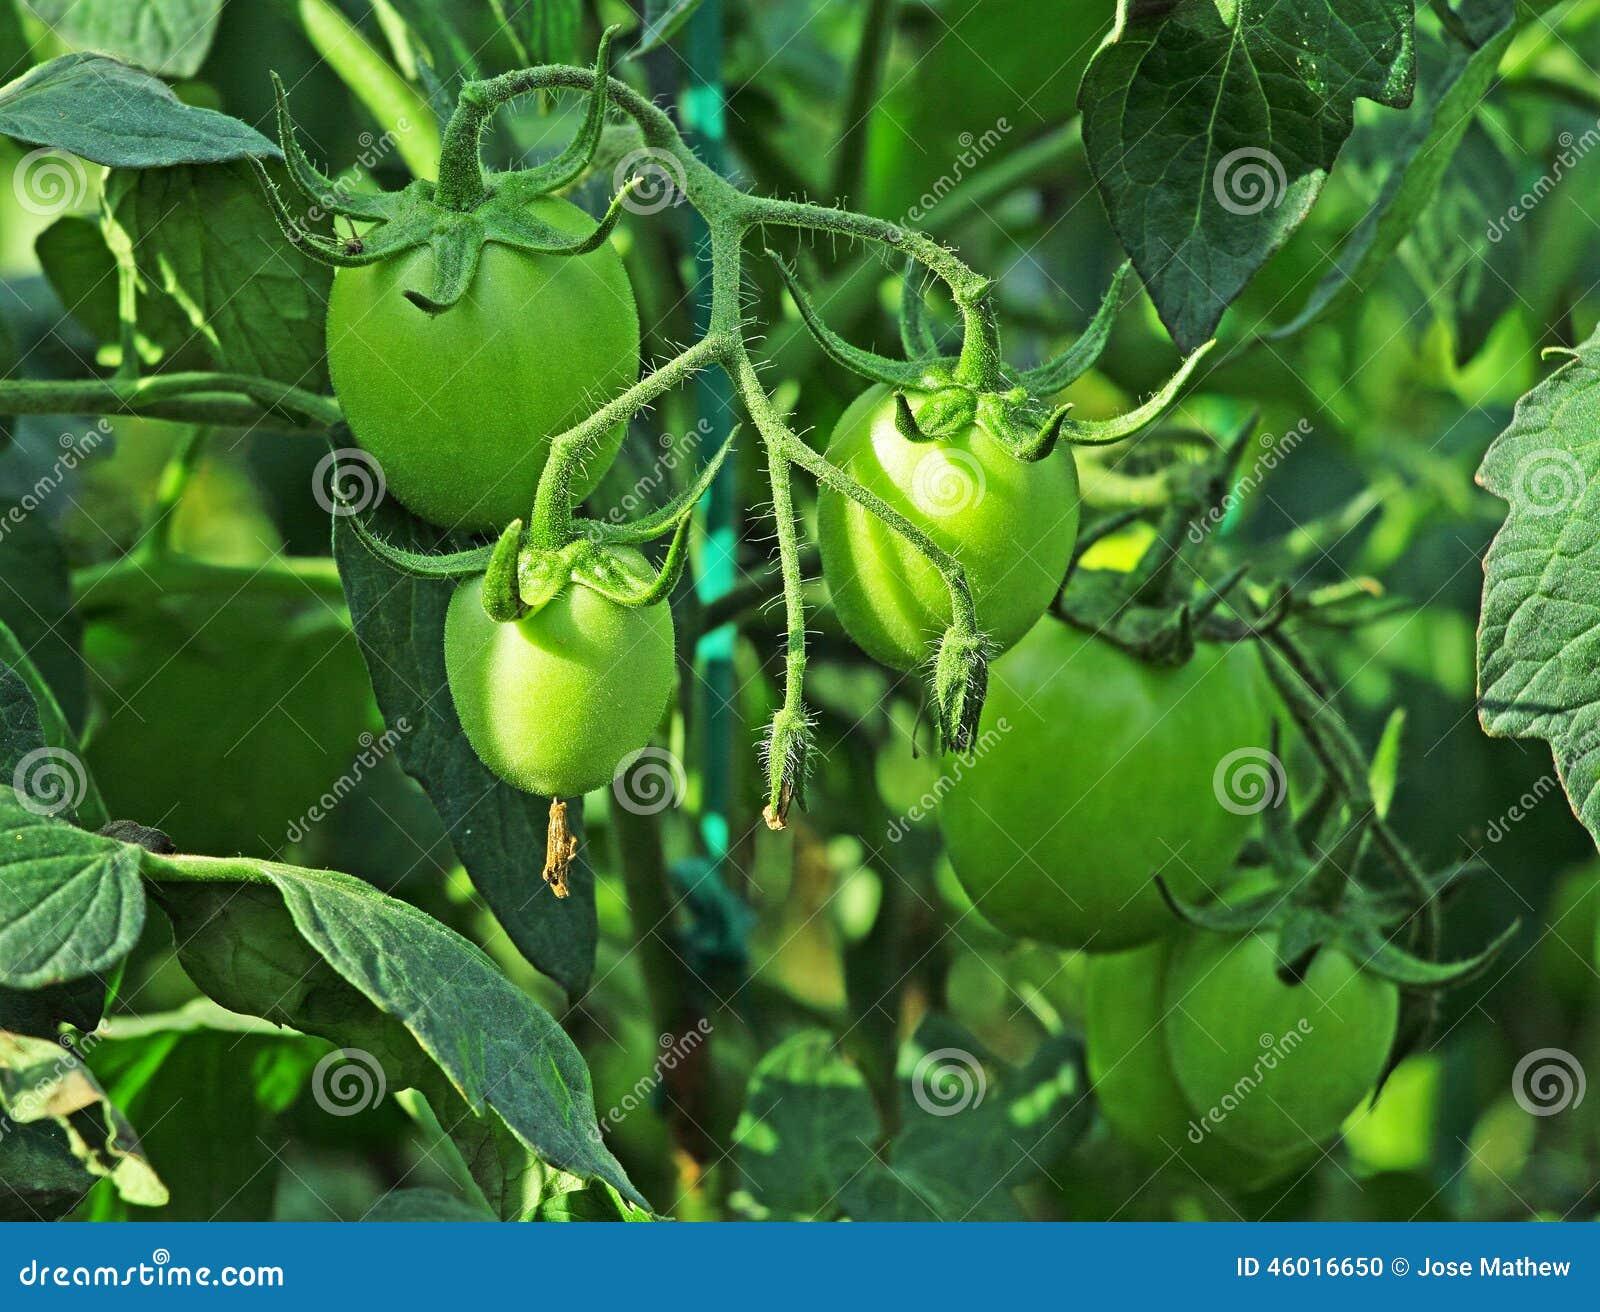 Unripe tomater